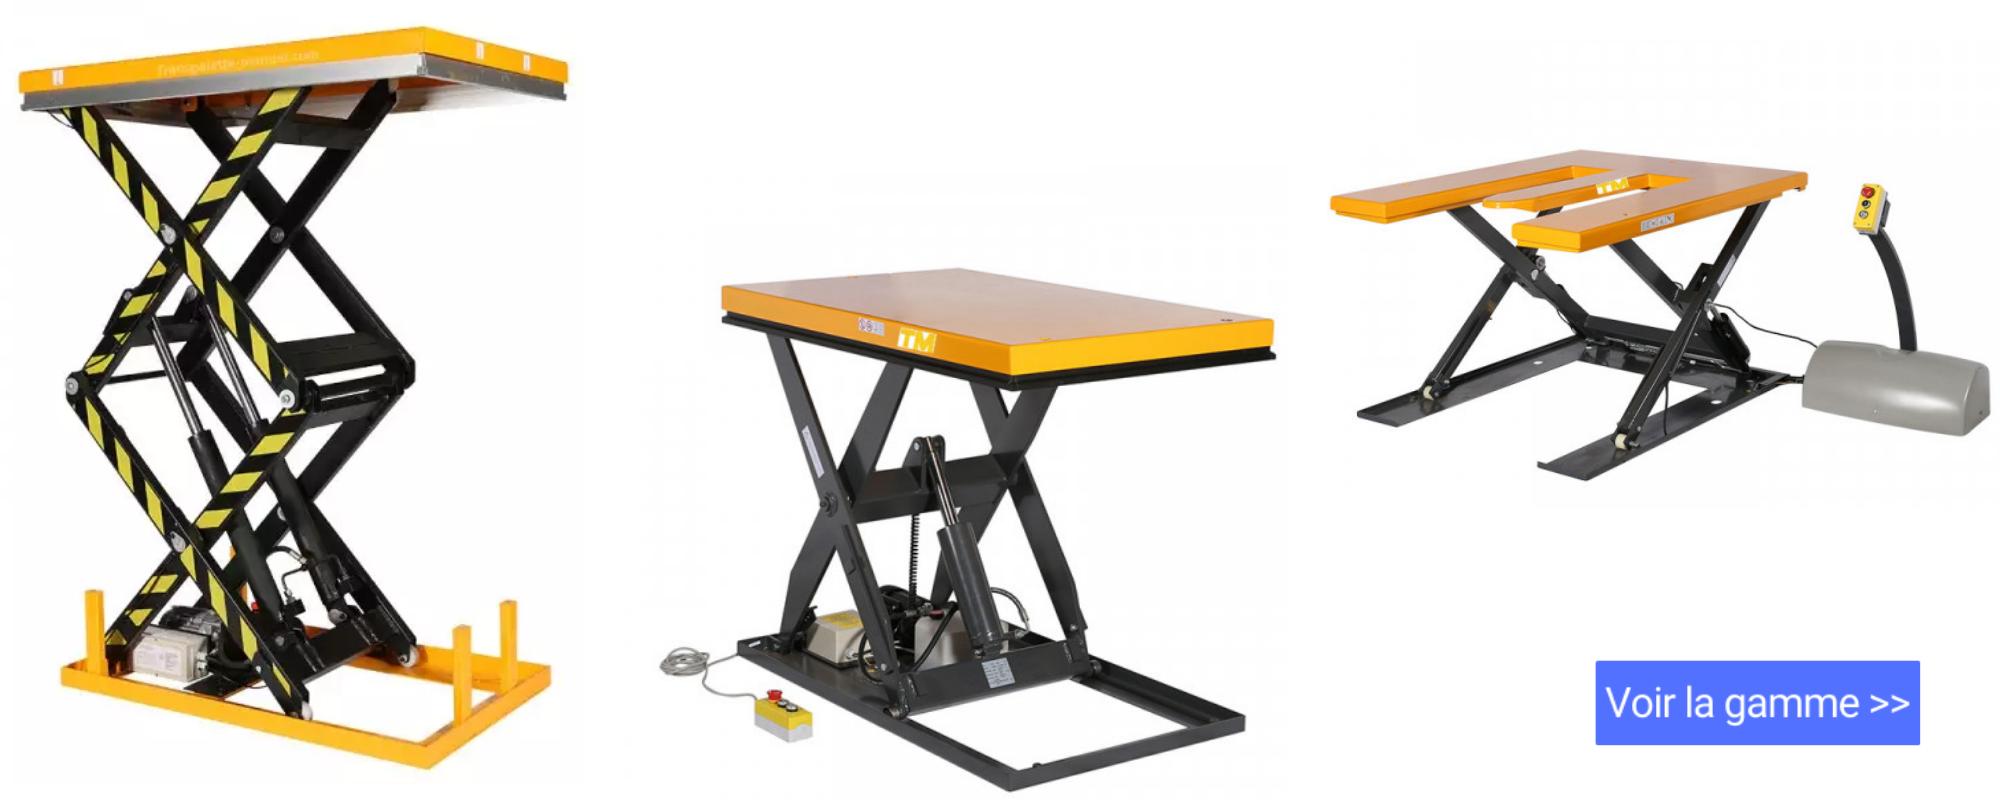 tables elevatrices electriques fixes